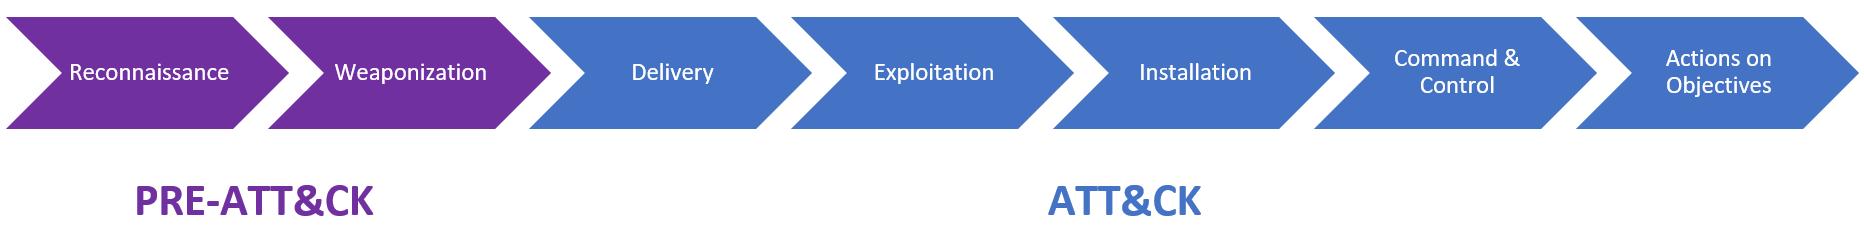 Diagram: Cyber kill chain phase to Miter ATT & CK